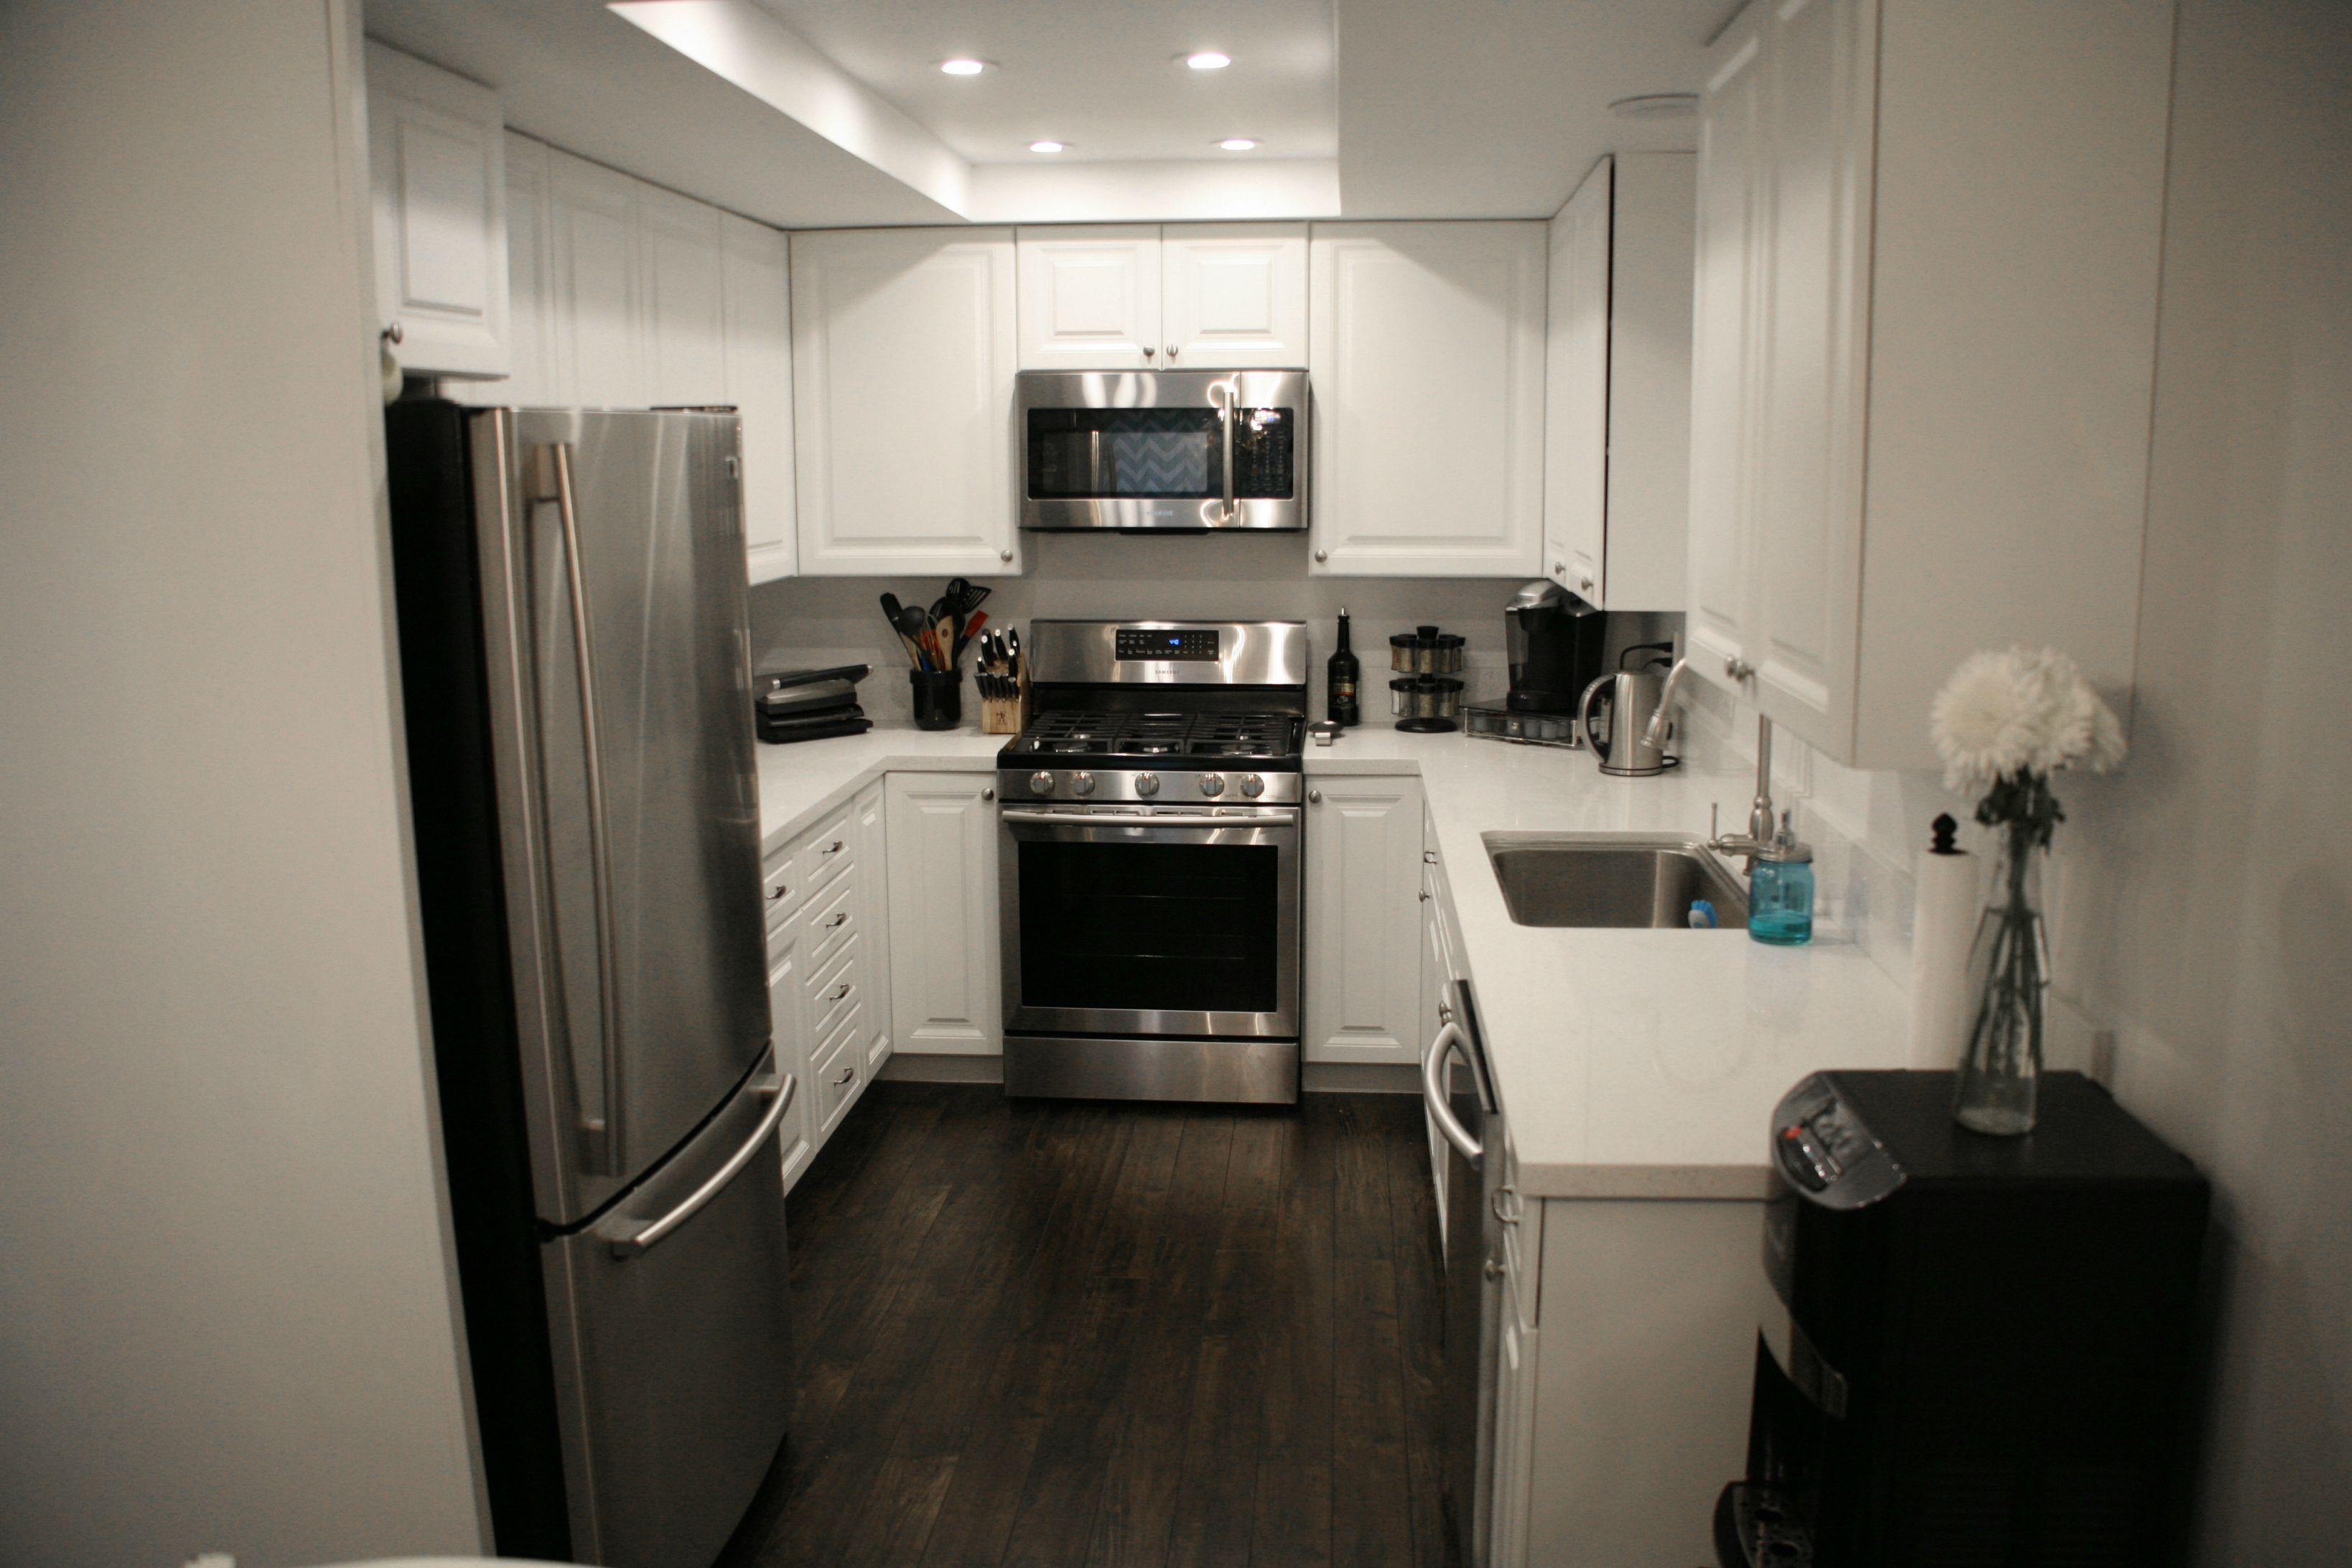 White Kitchens Dark Floors First Home Renovation Grey Walls Basin Sink And Valspar